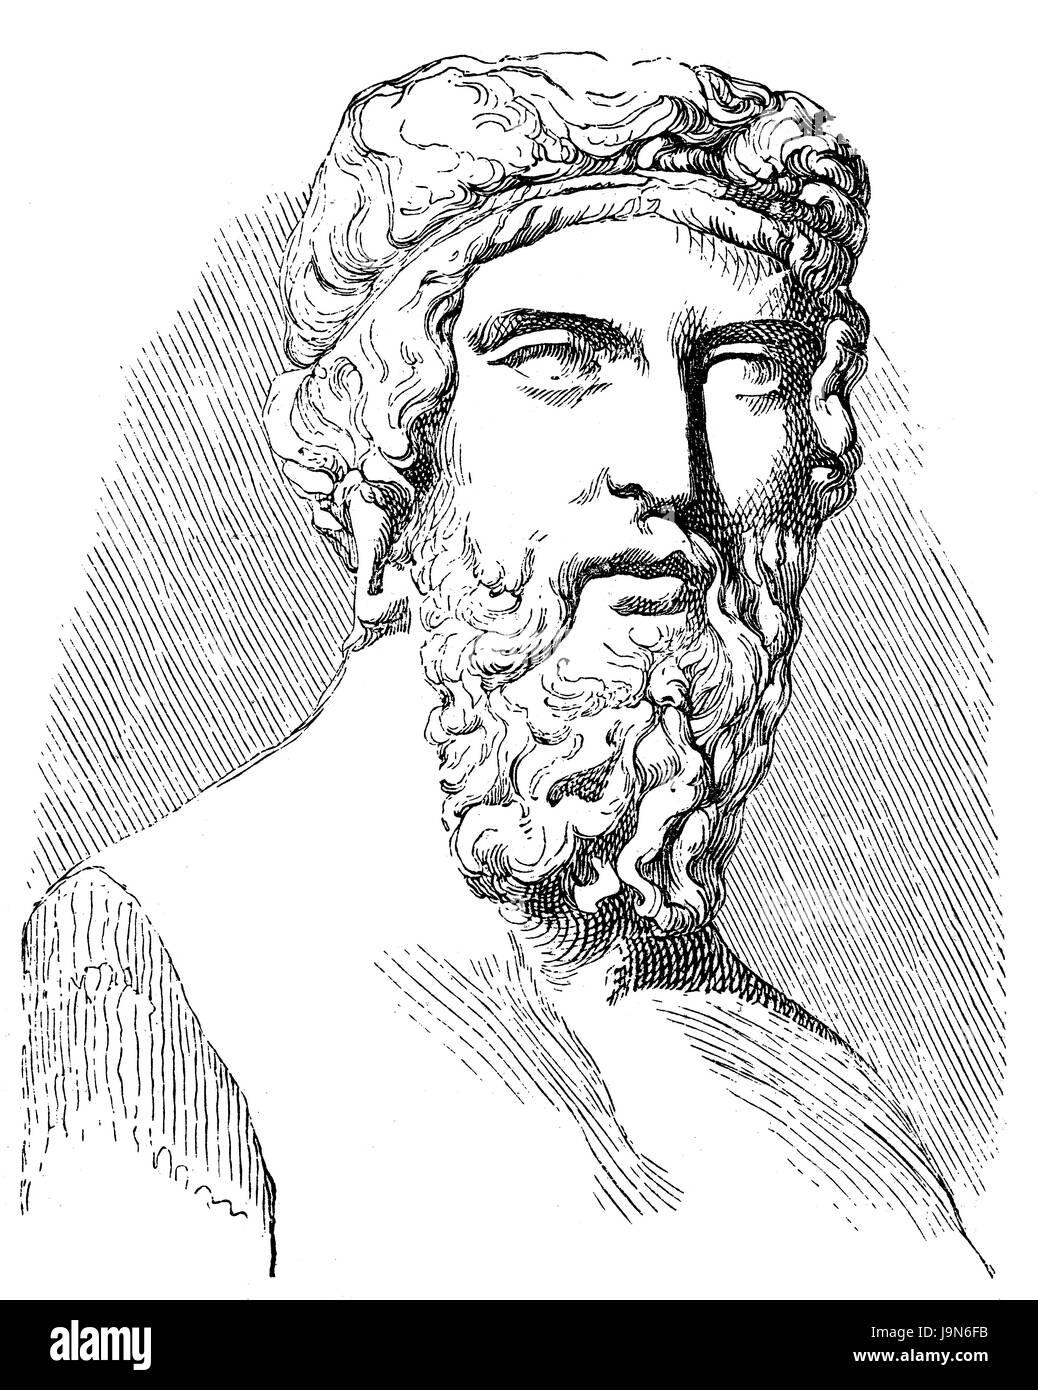 Platon or Plato, 428 BC - 348 BC, an ancient Greek philosopher - Stock Image